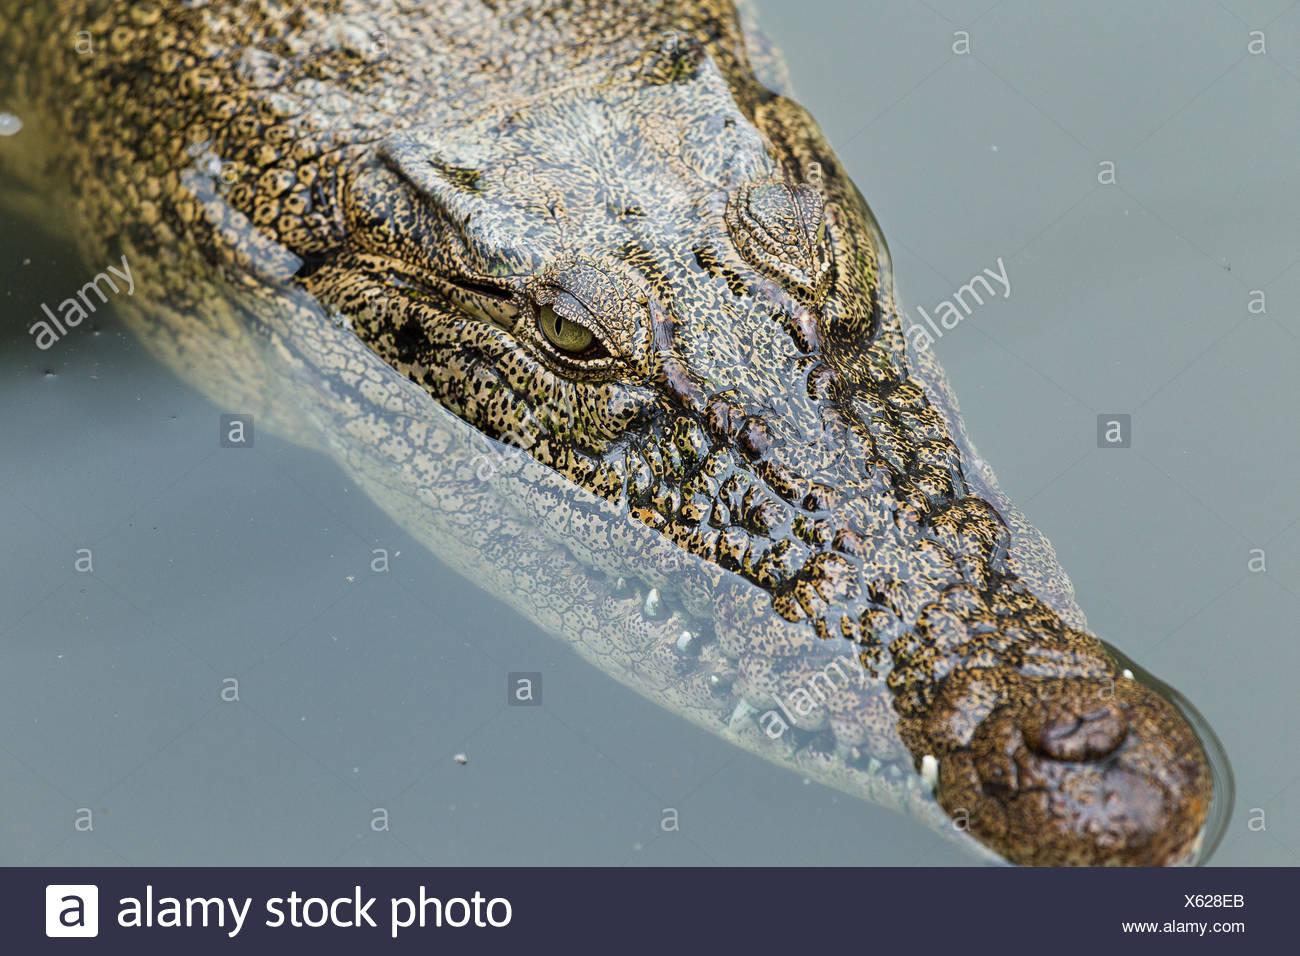 Swimming Crocodile - Stock Image